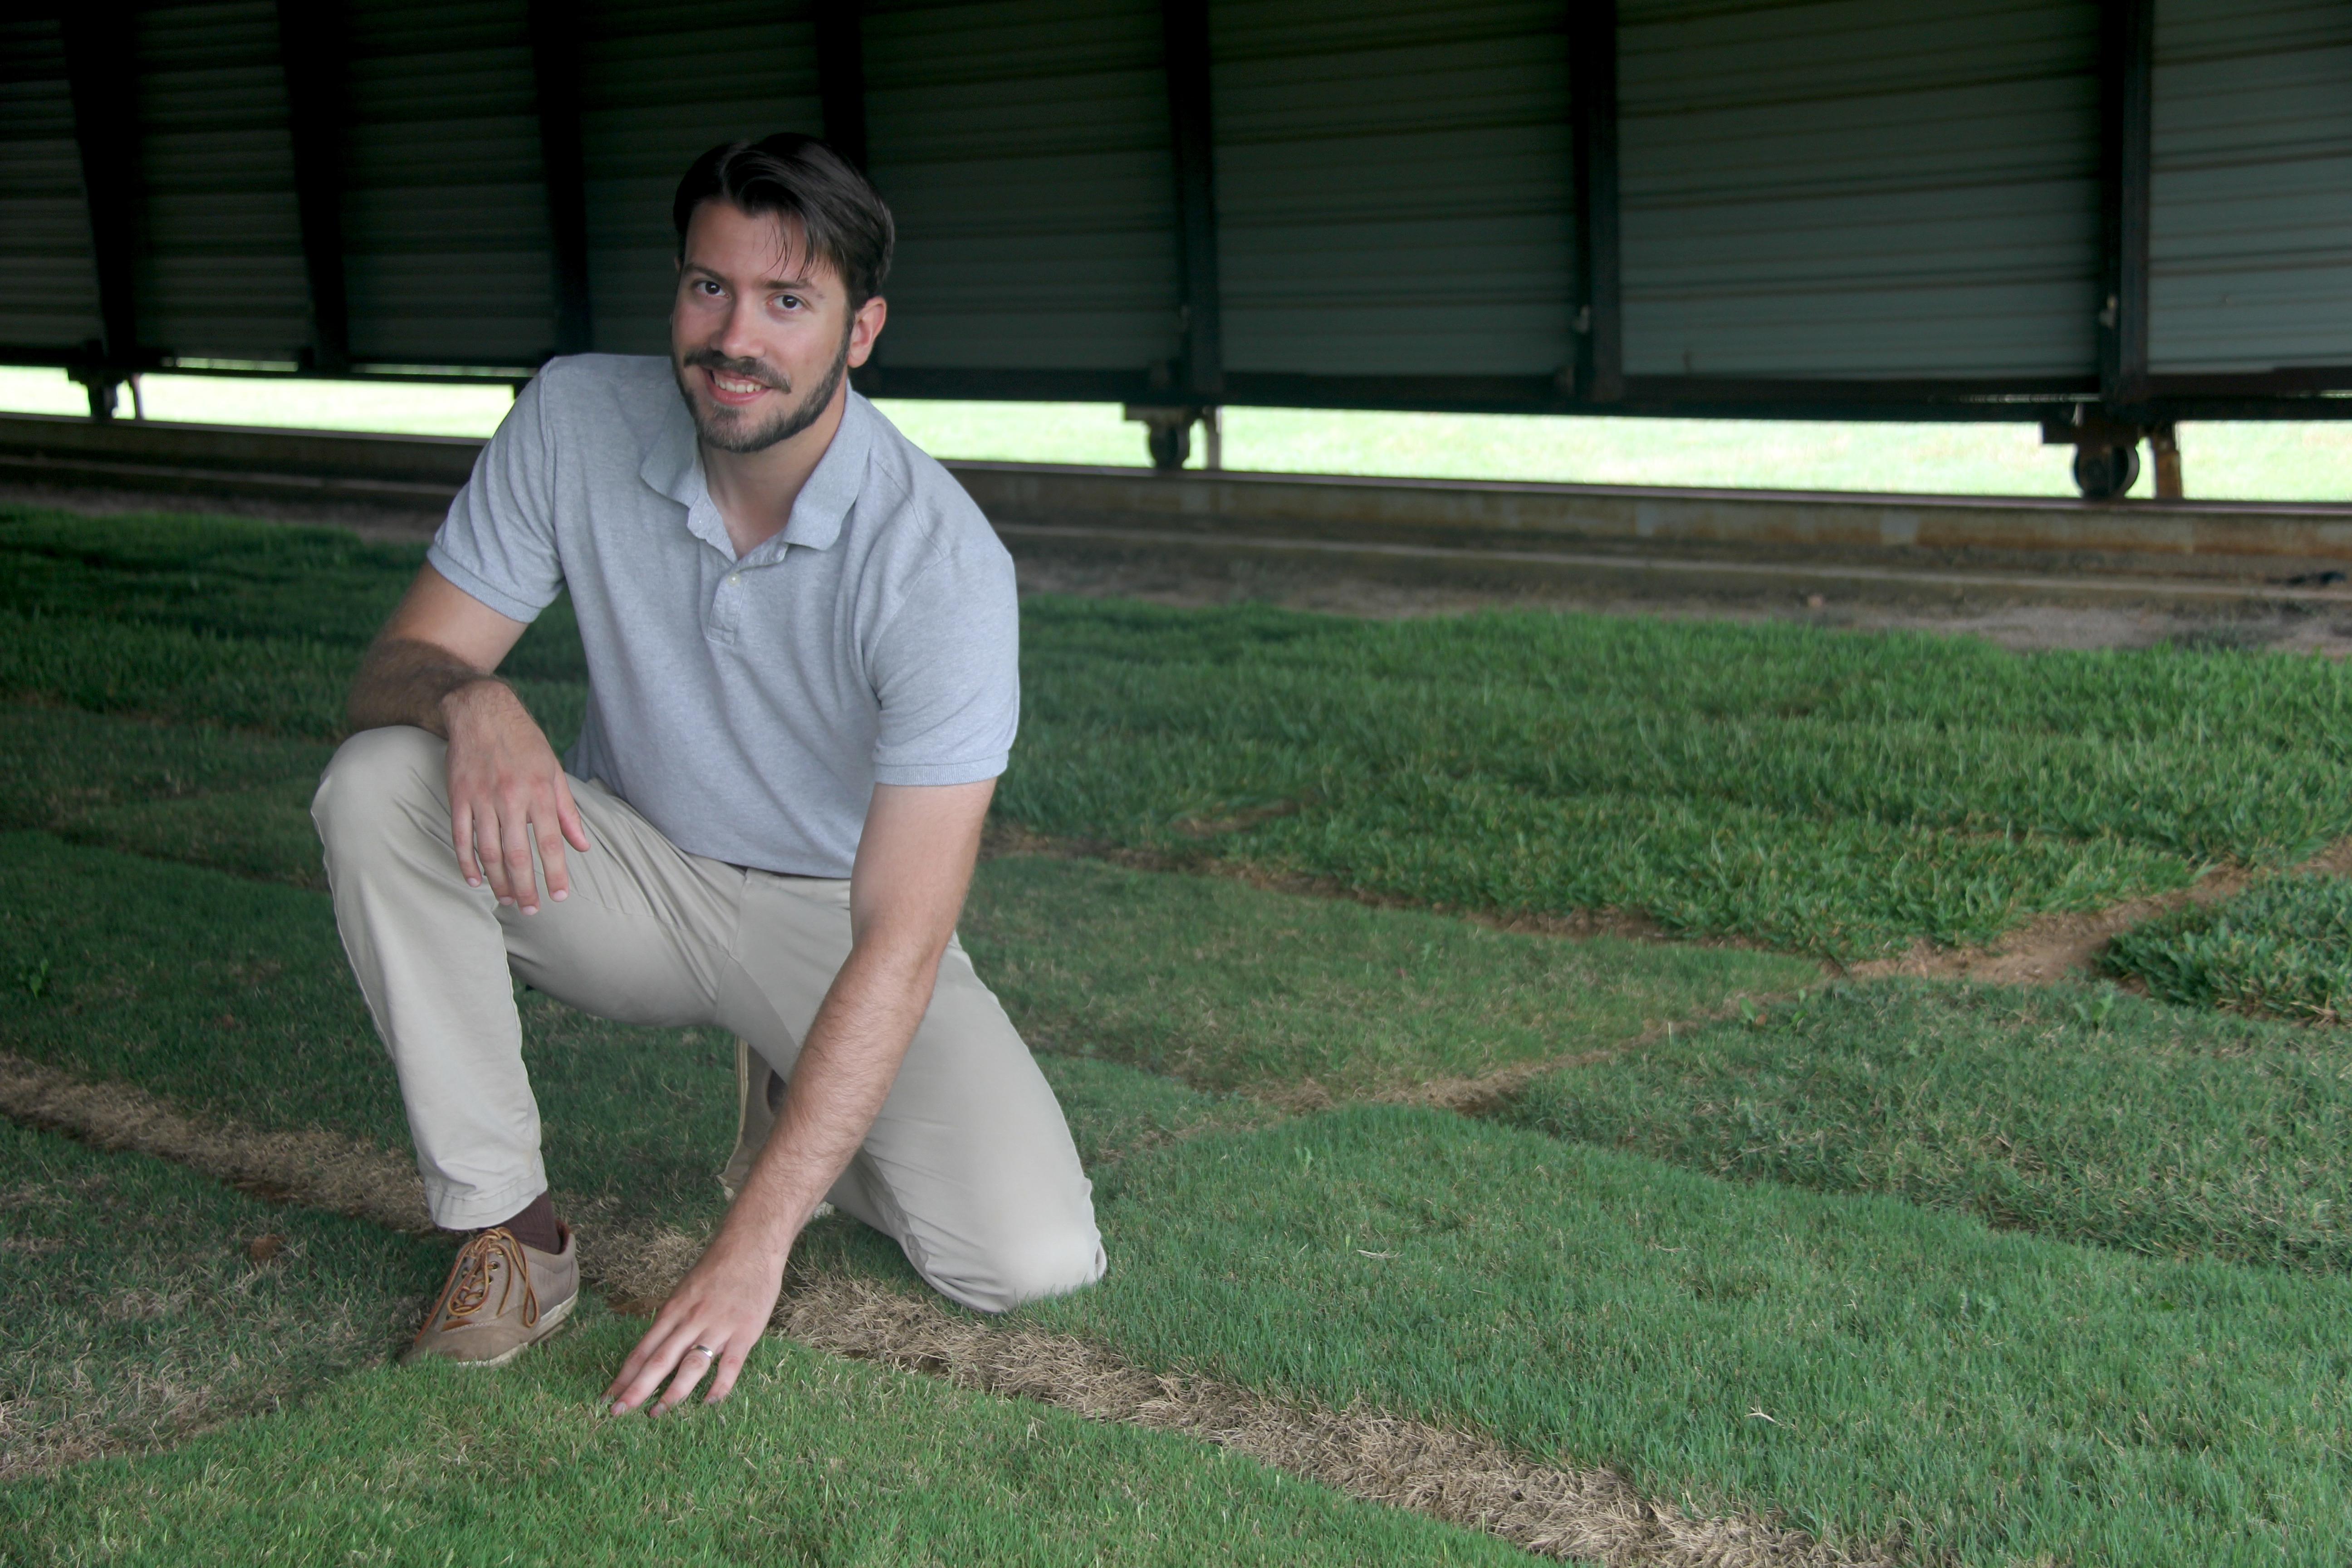 David Jespersen is the newest member of the University of Georgia Turfgrass Team.